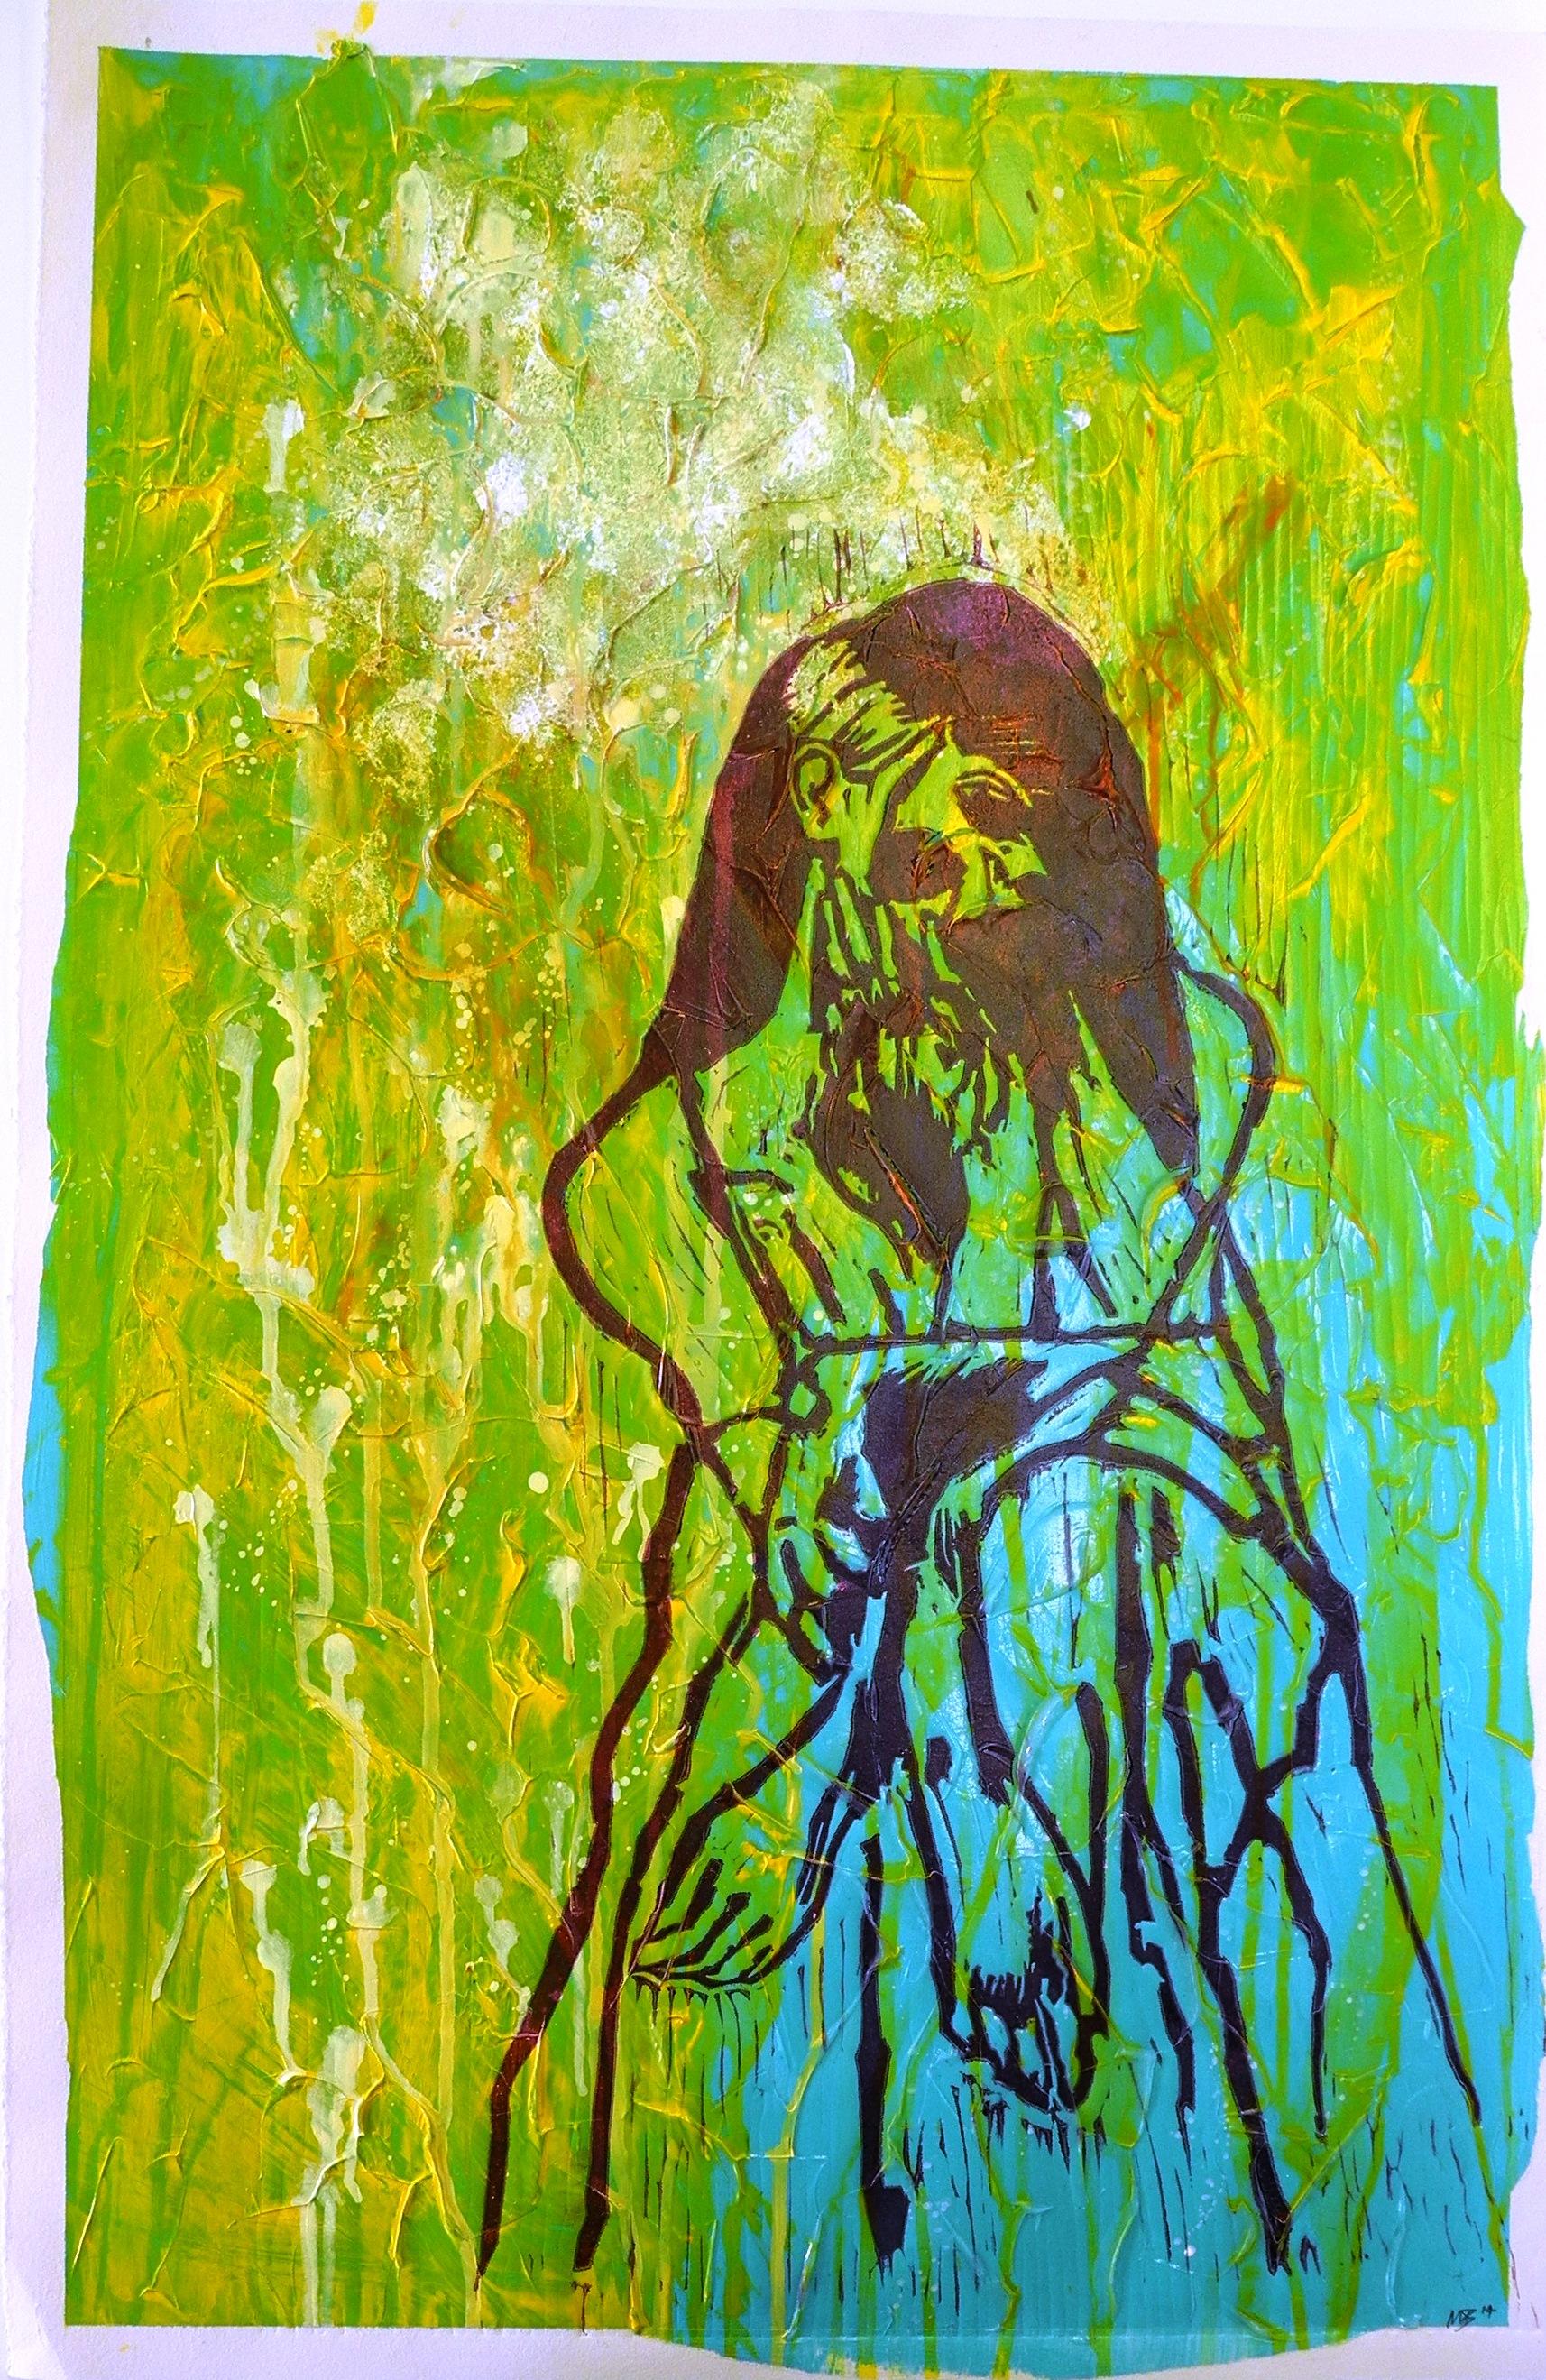 Untitled 1, print